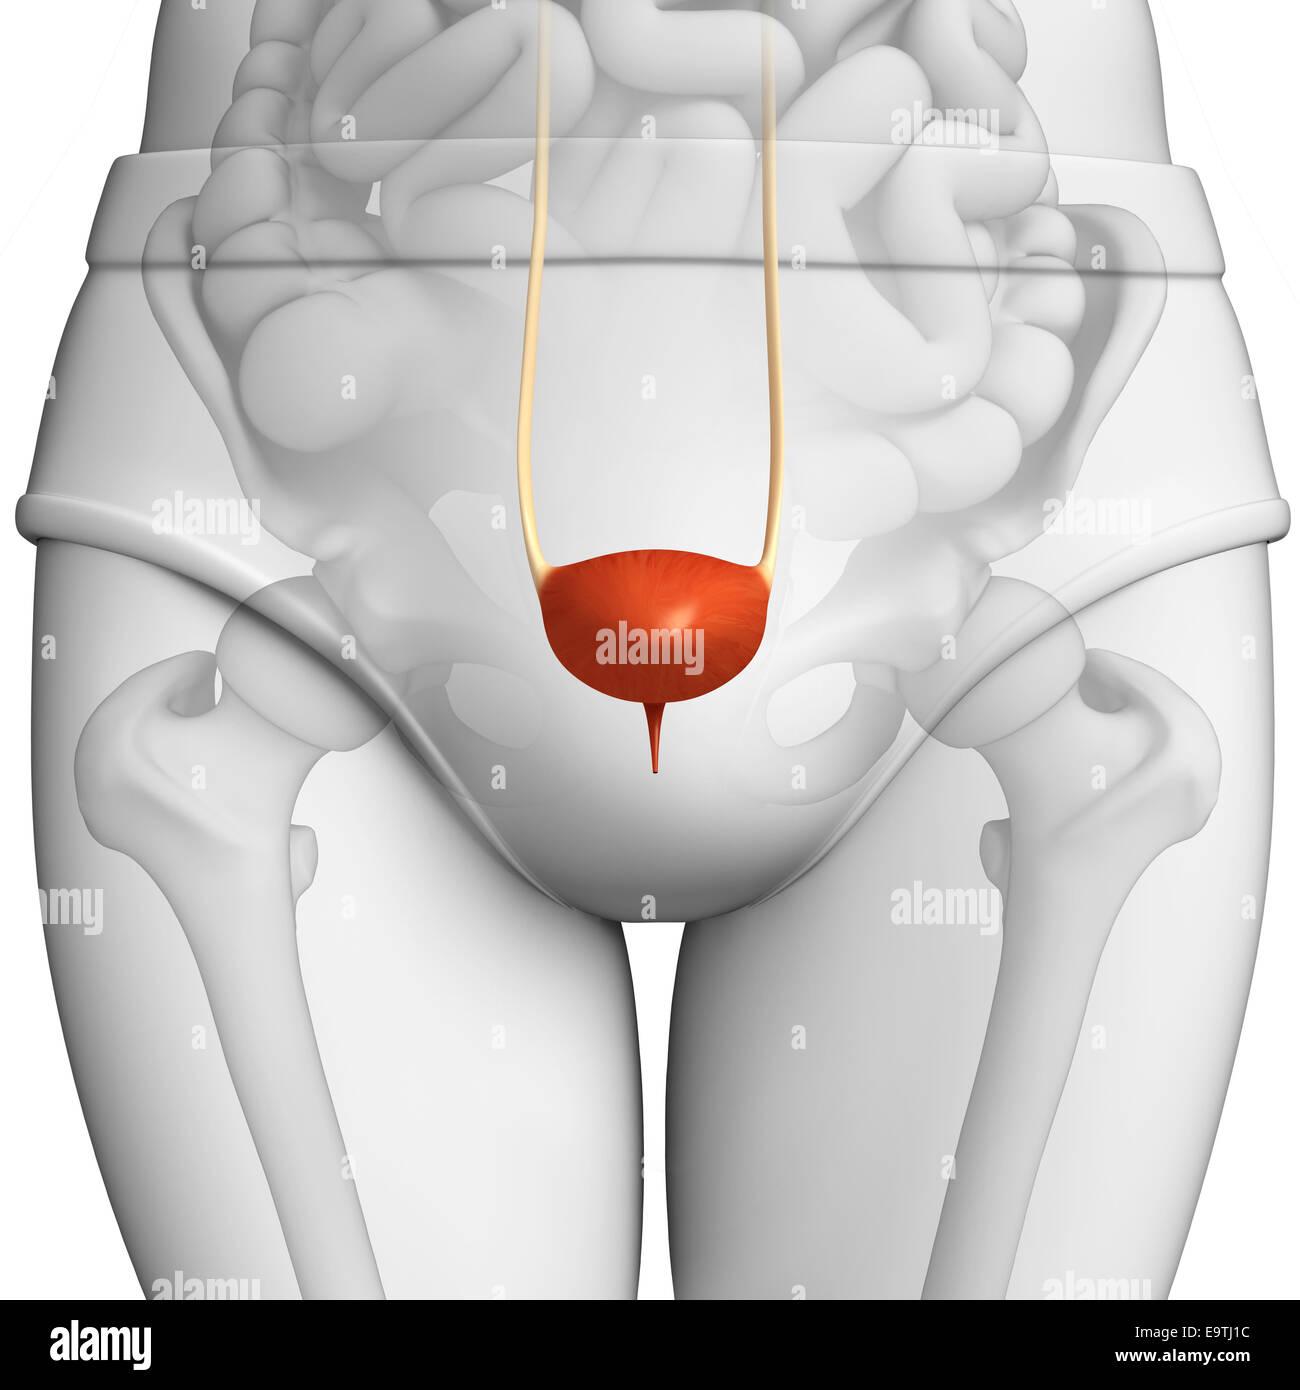 Anatomy Male Female Urinary Bladder Stockfotos & Anatomy Male Female ...